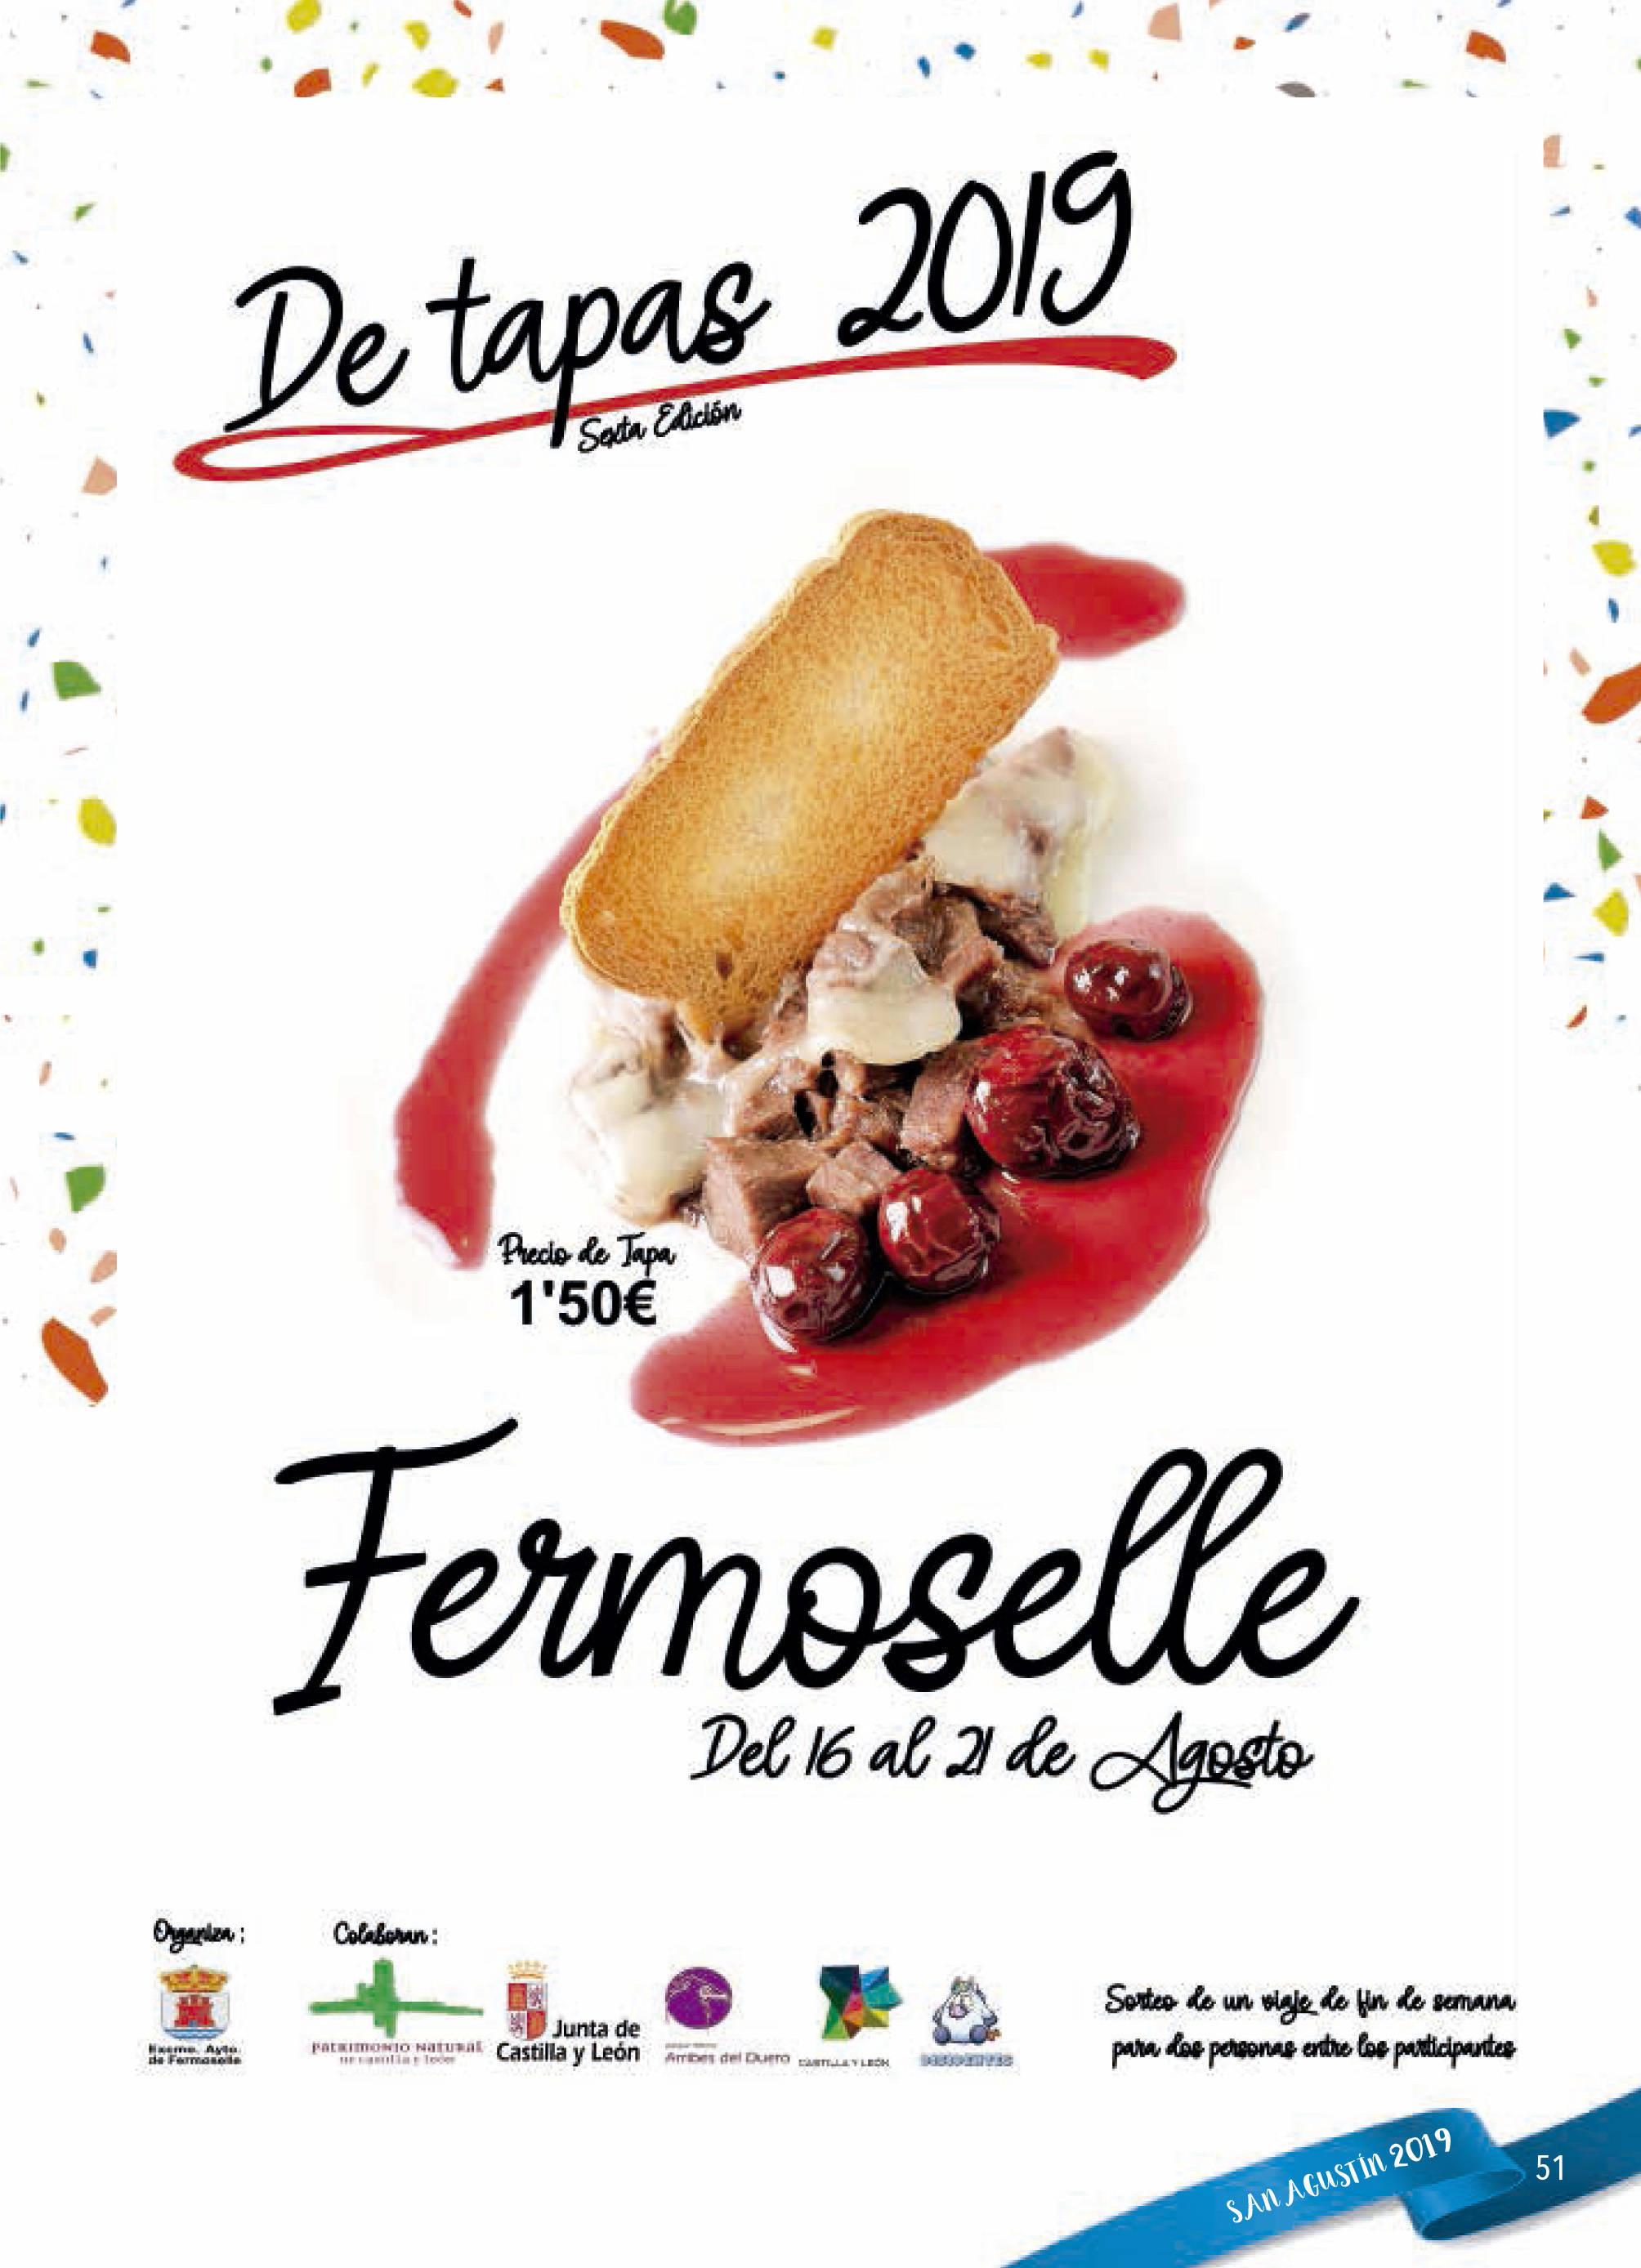 Programa de ferias y fiestas 2019 - Fermoselle (Zamora) 20